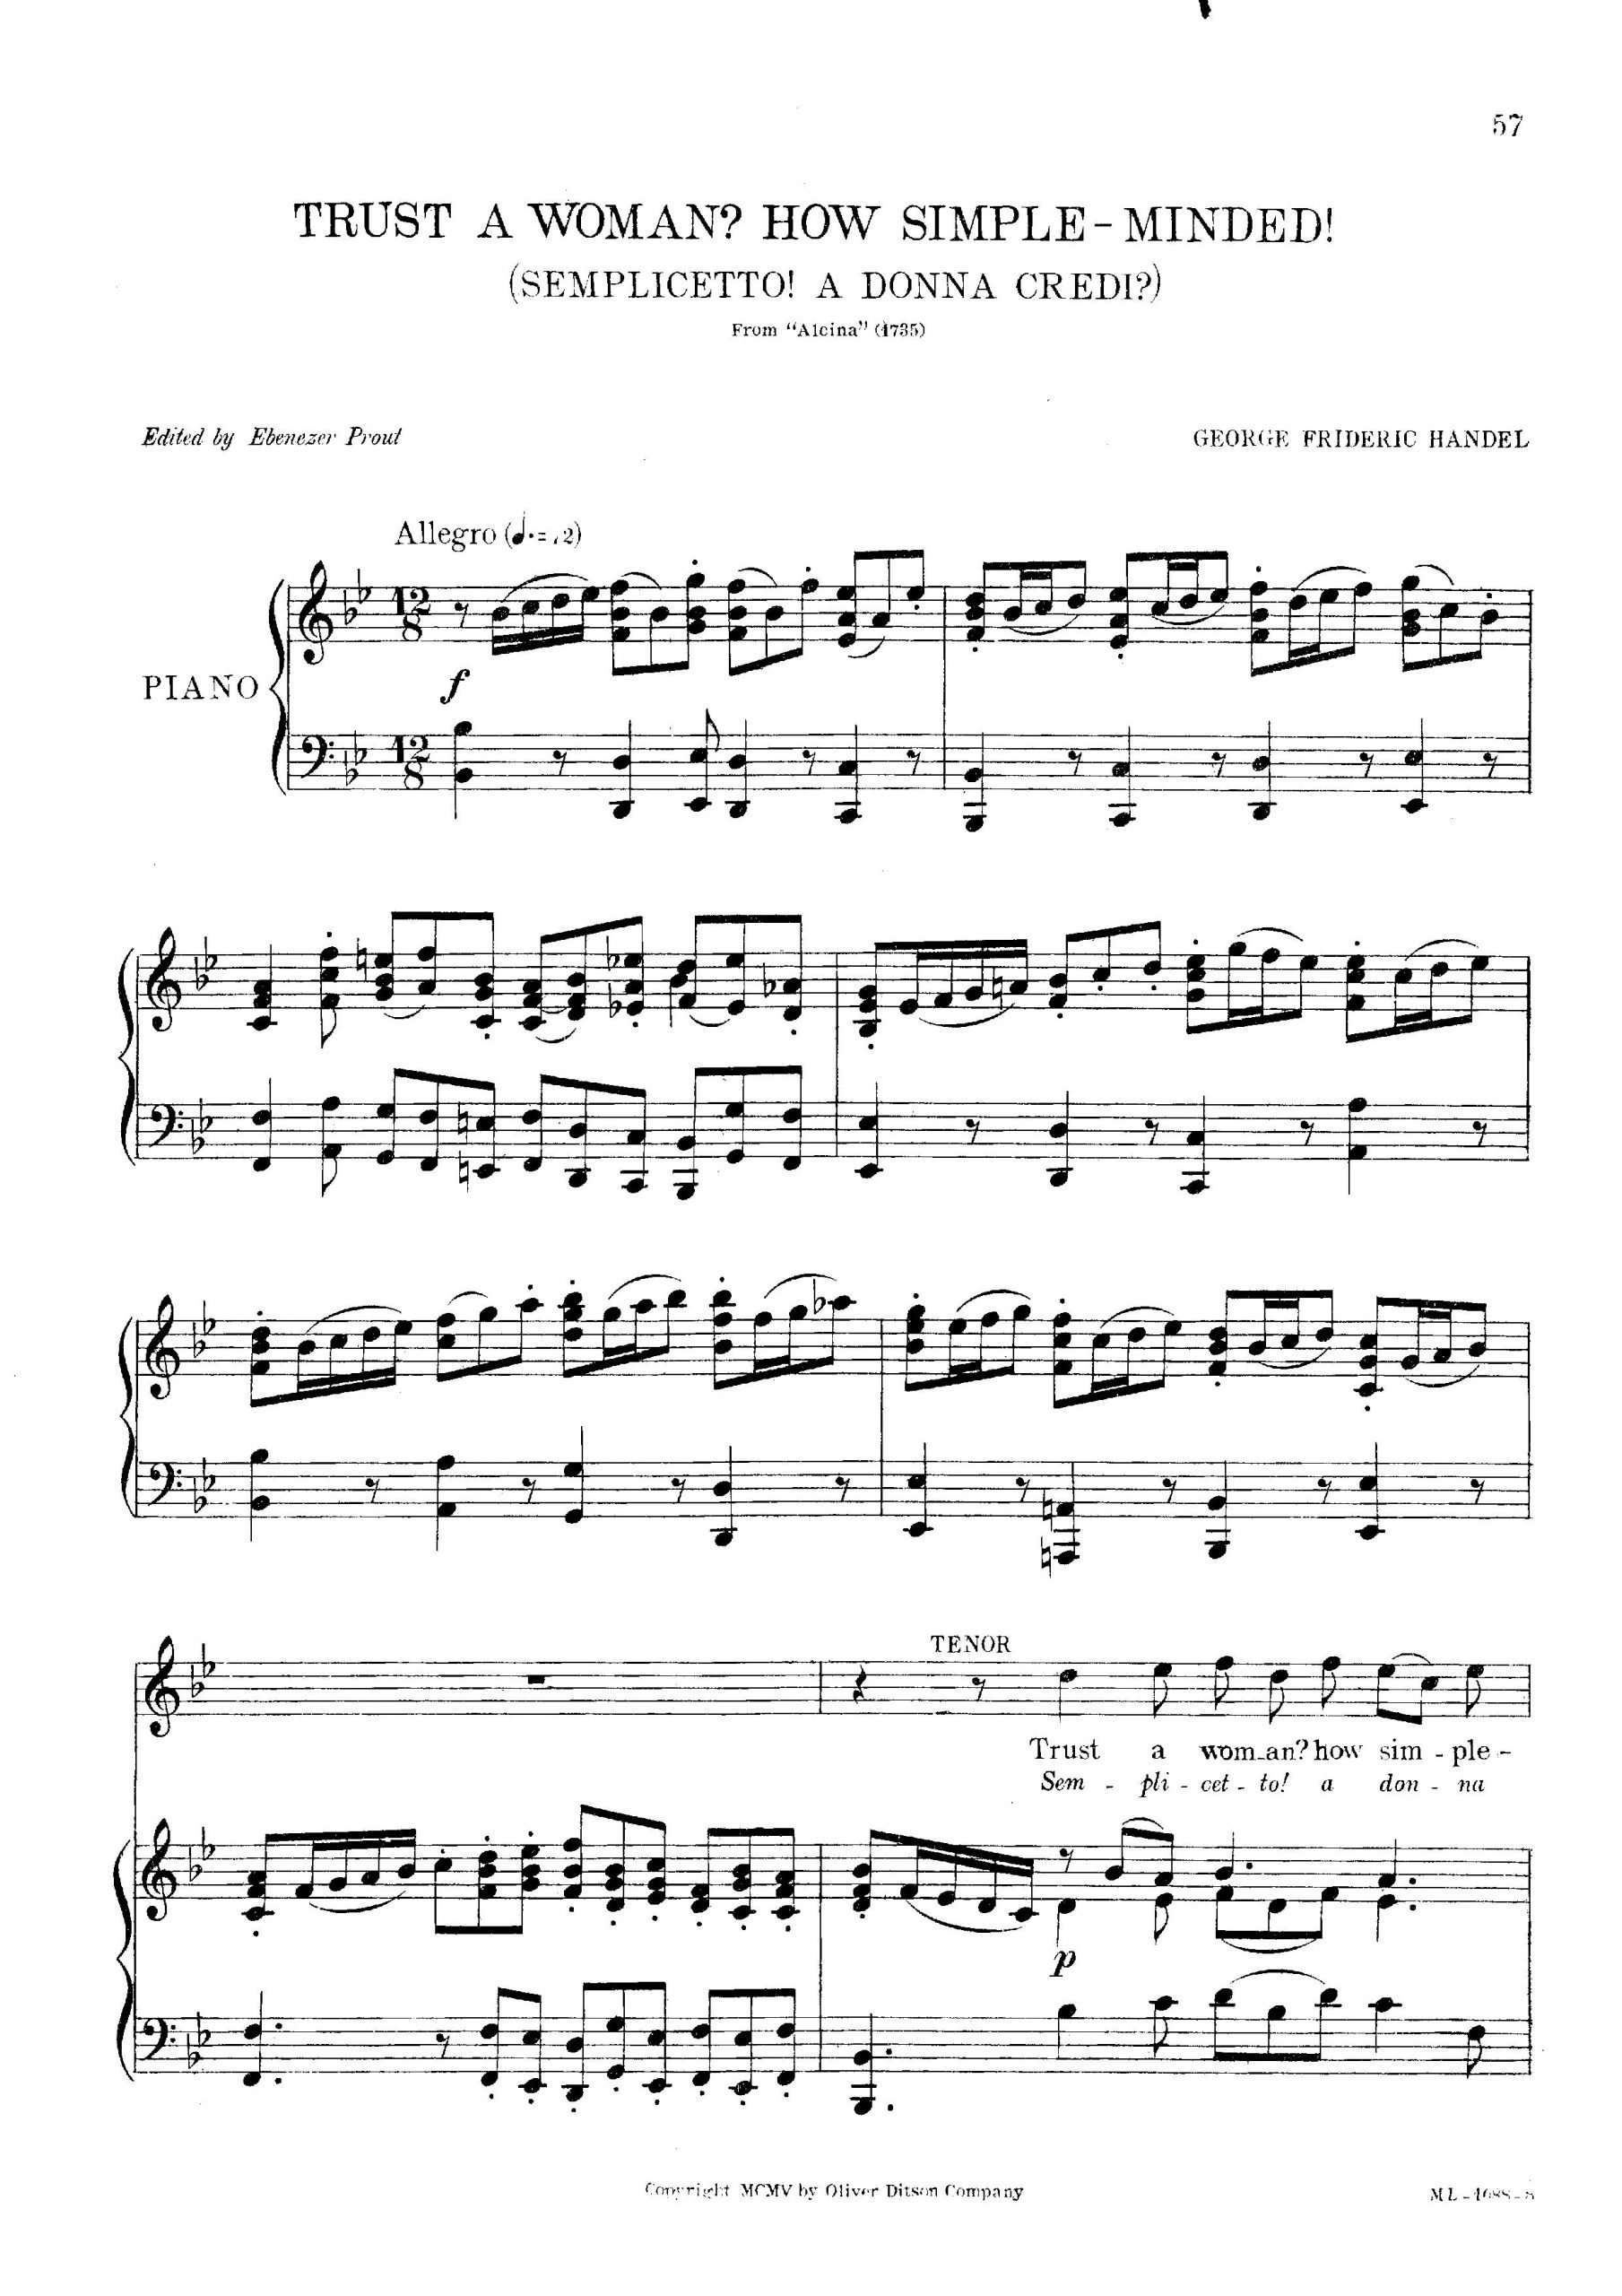 Handel, George Frideric - Alcina, HWV 34 (12-Aria)